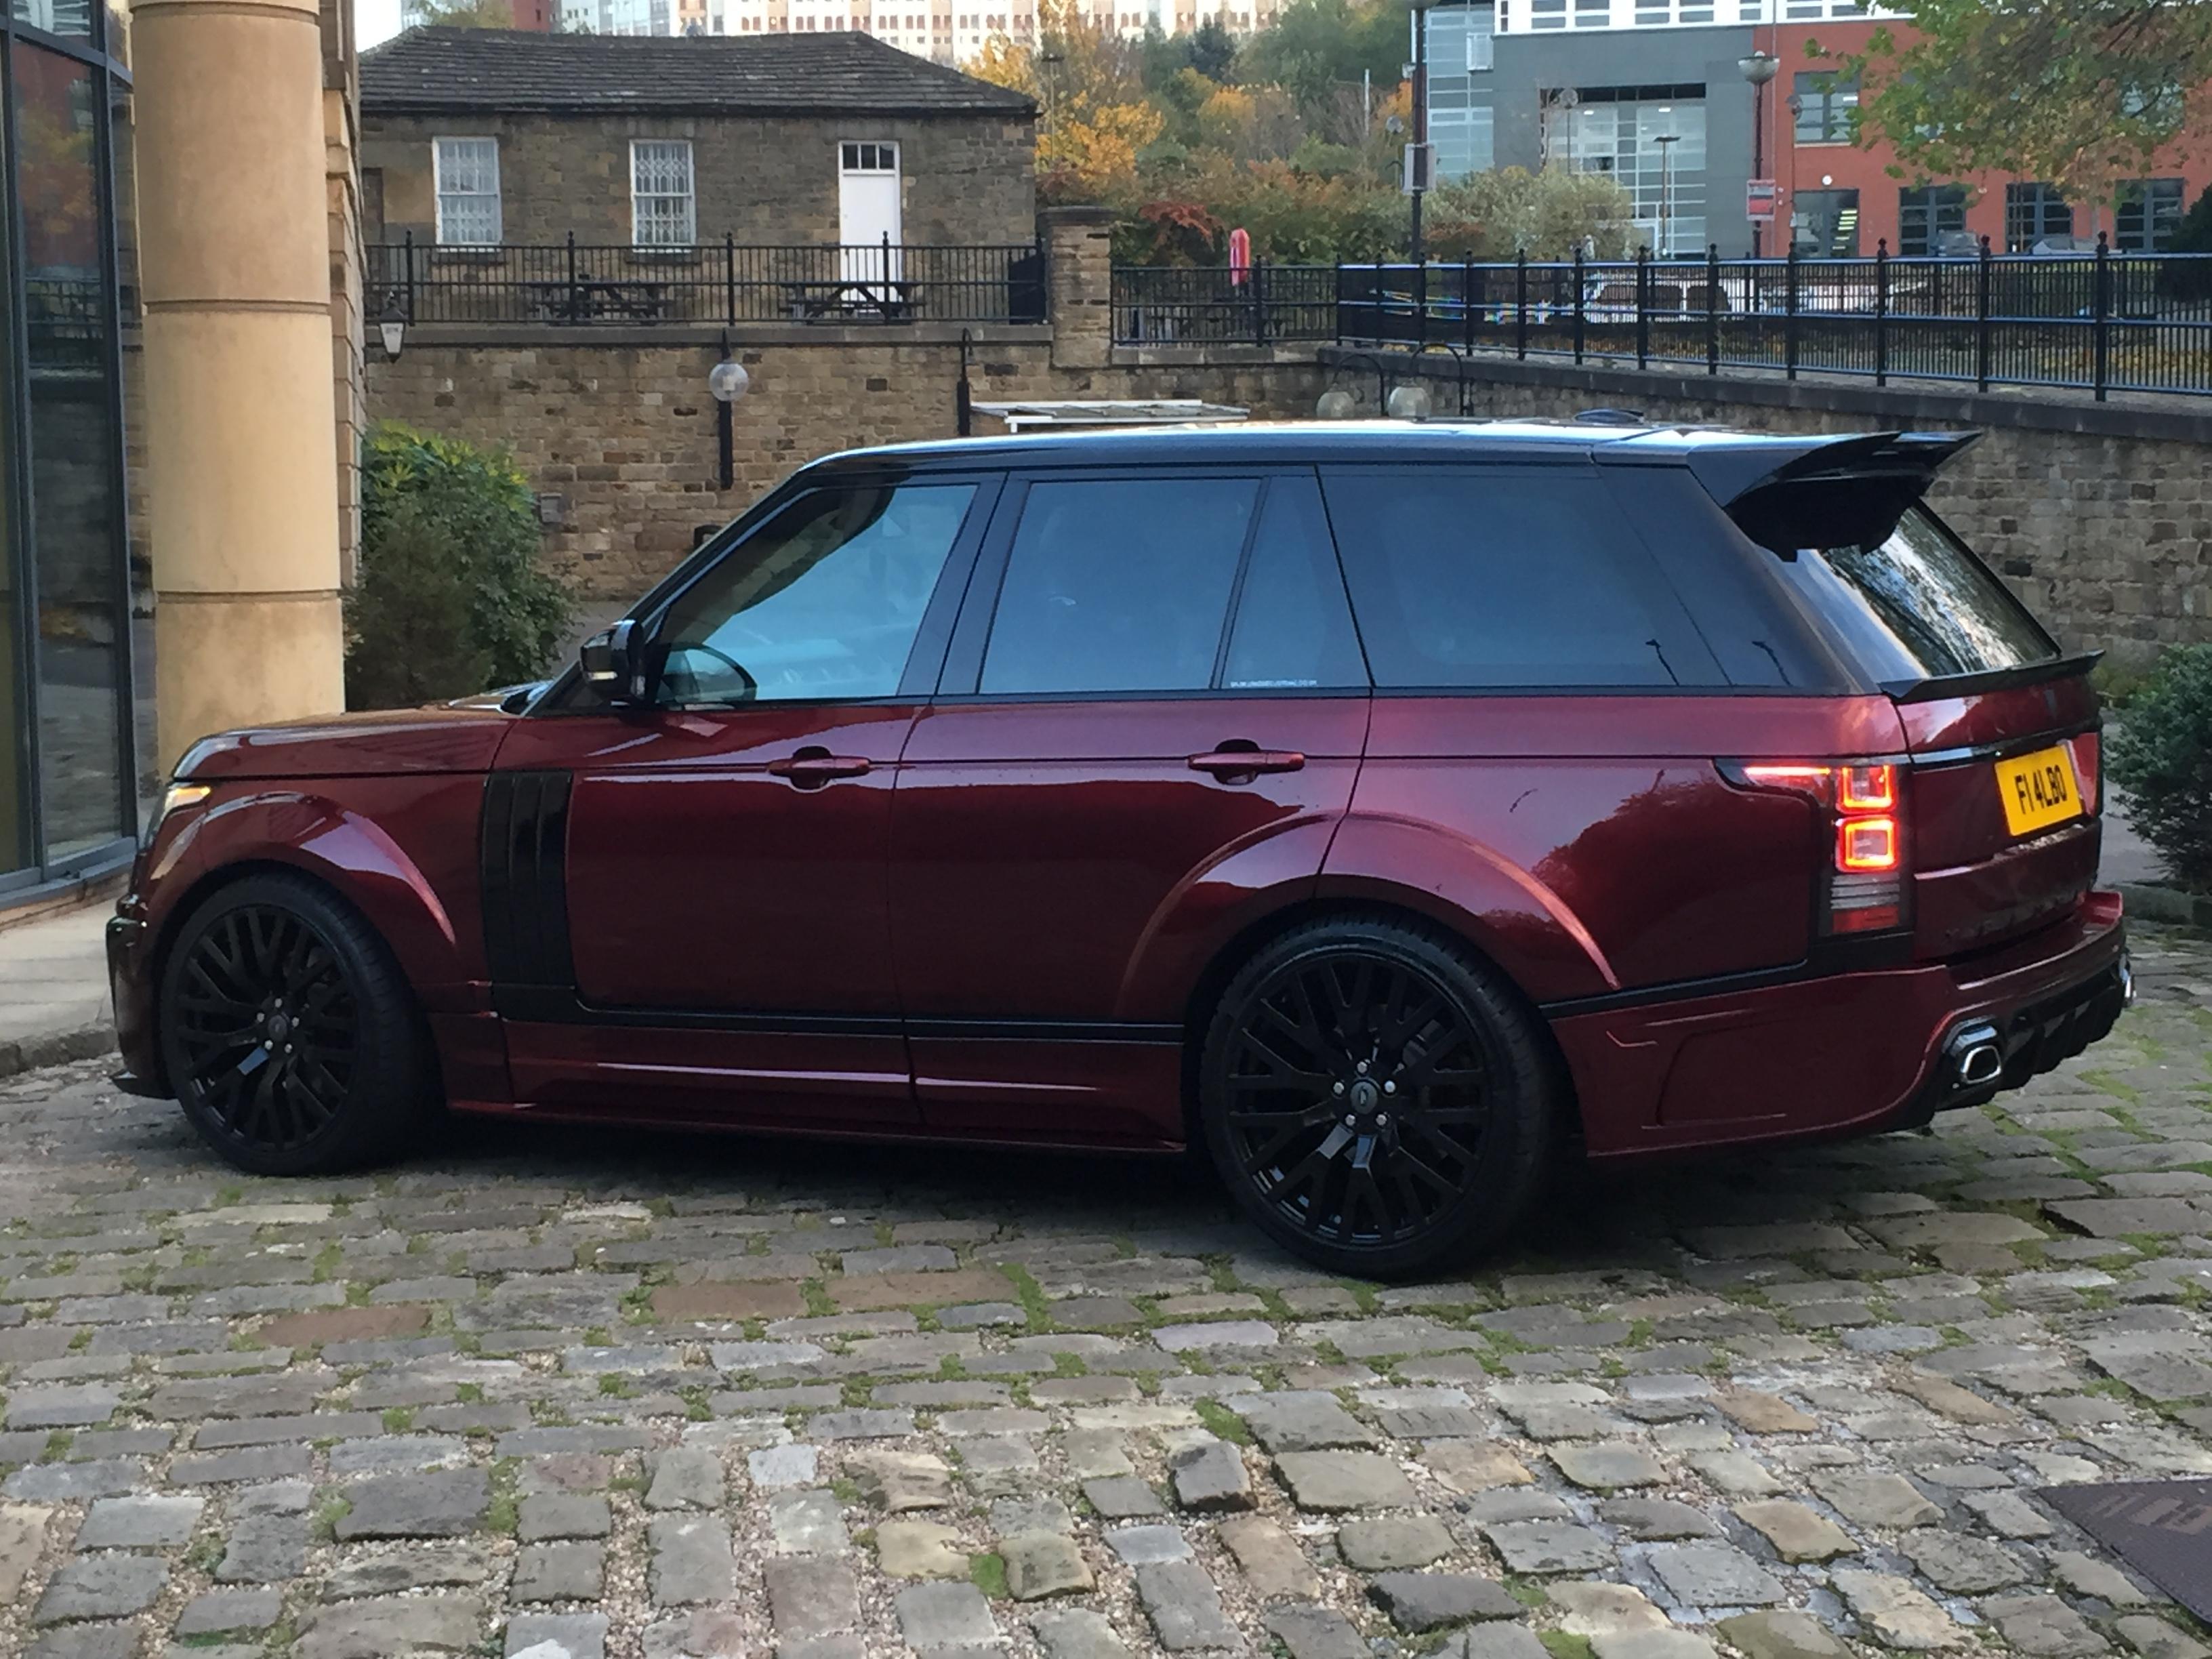 Range Rover Vogue L405 Full Body Kit Xclusive Customz